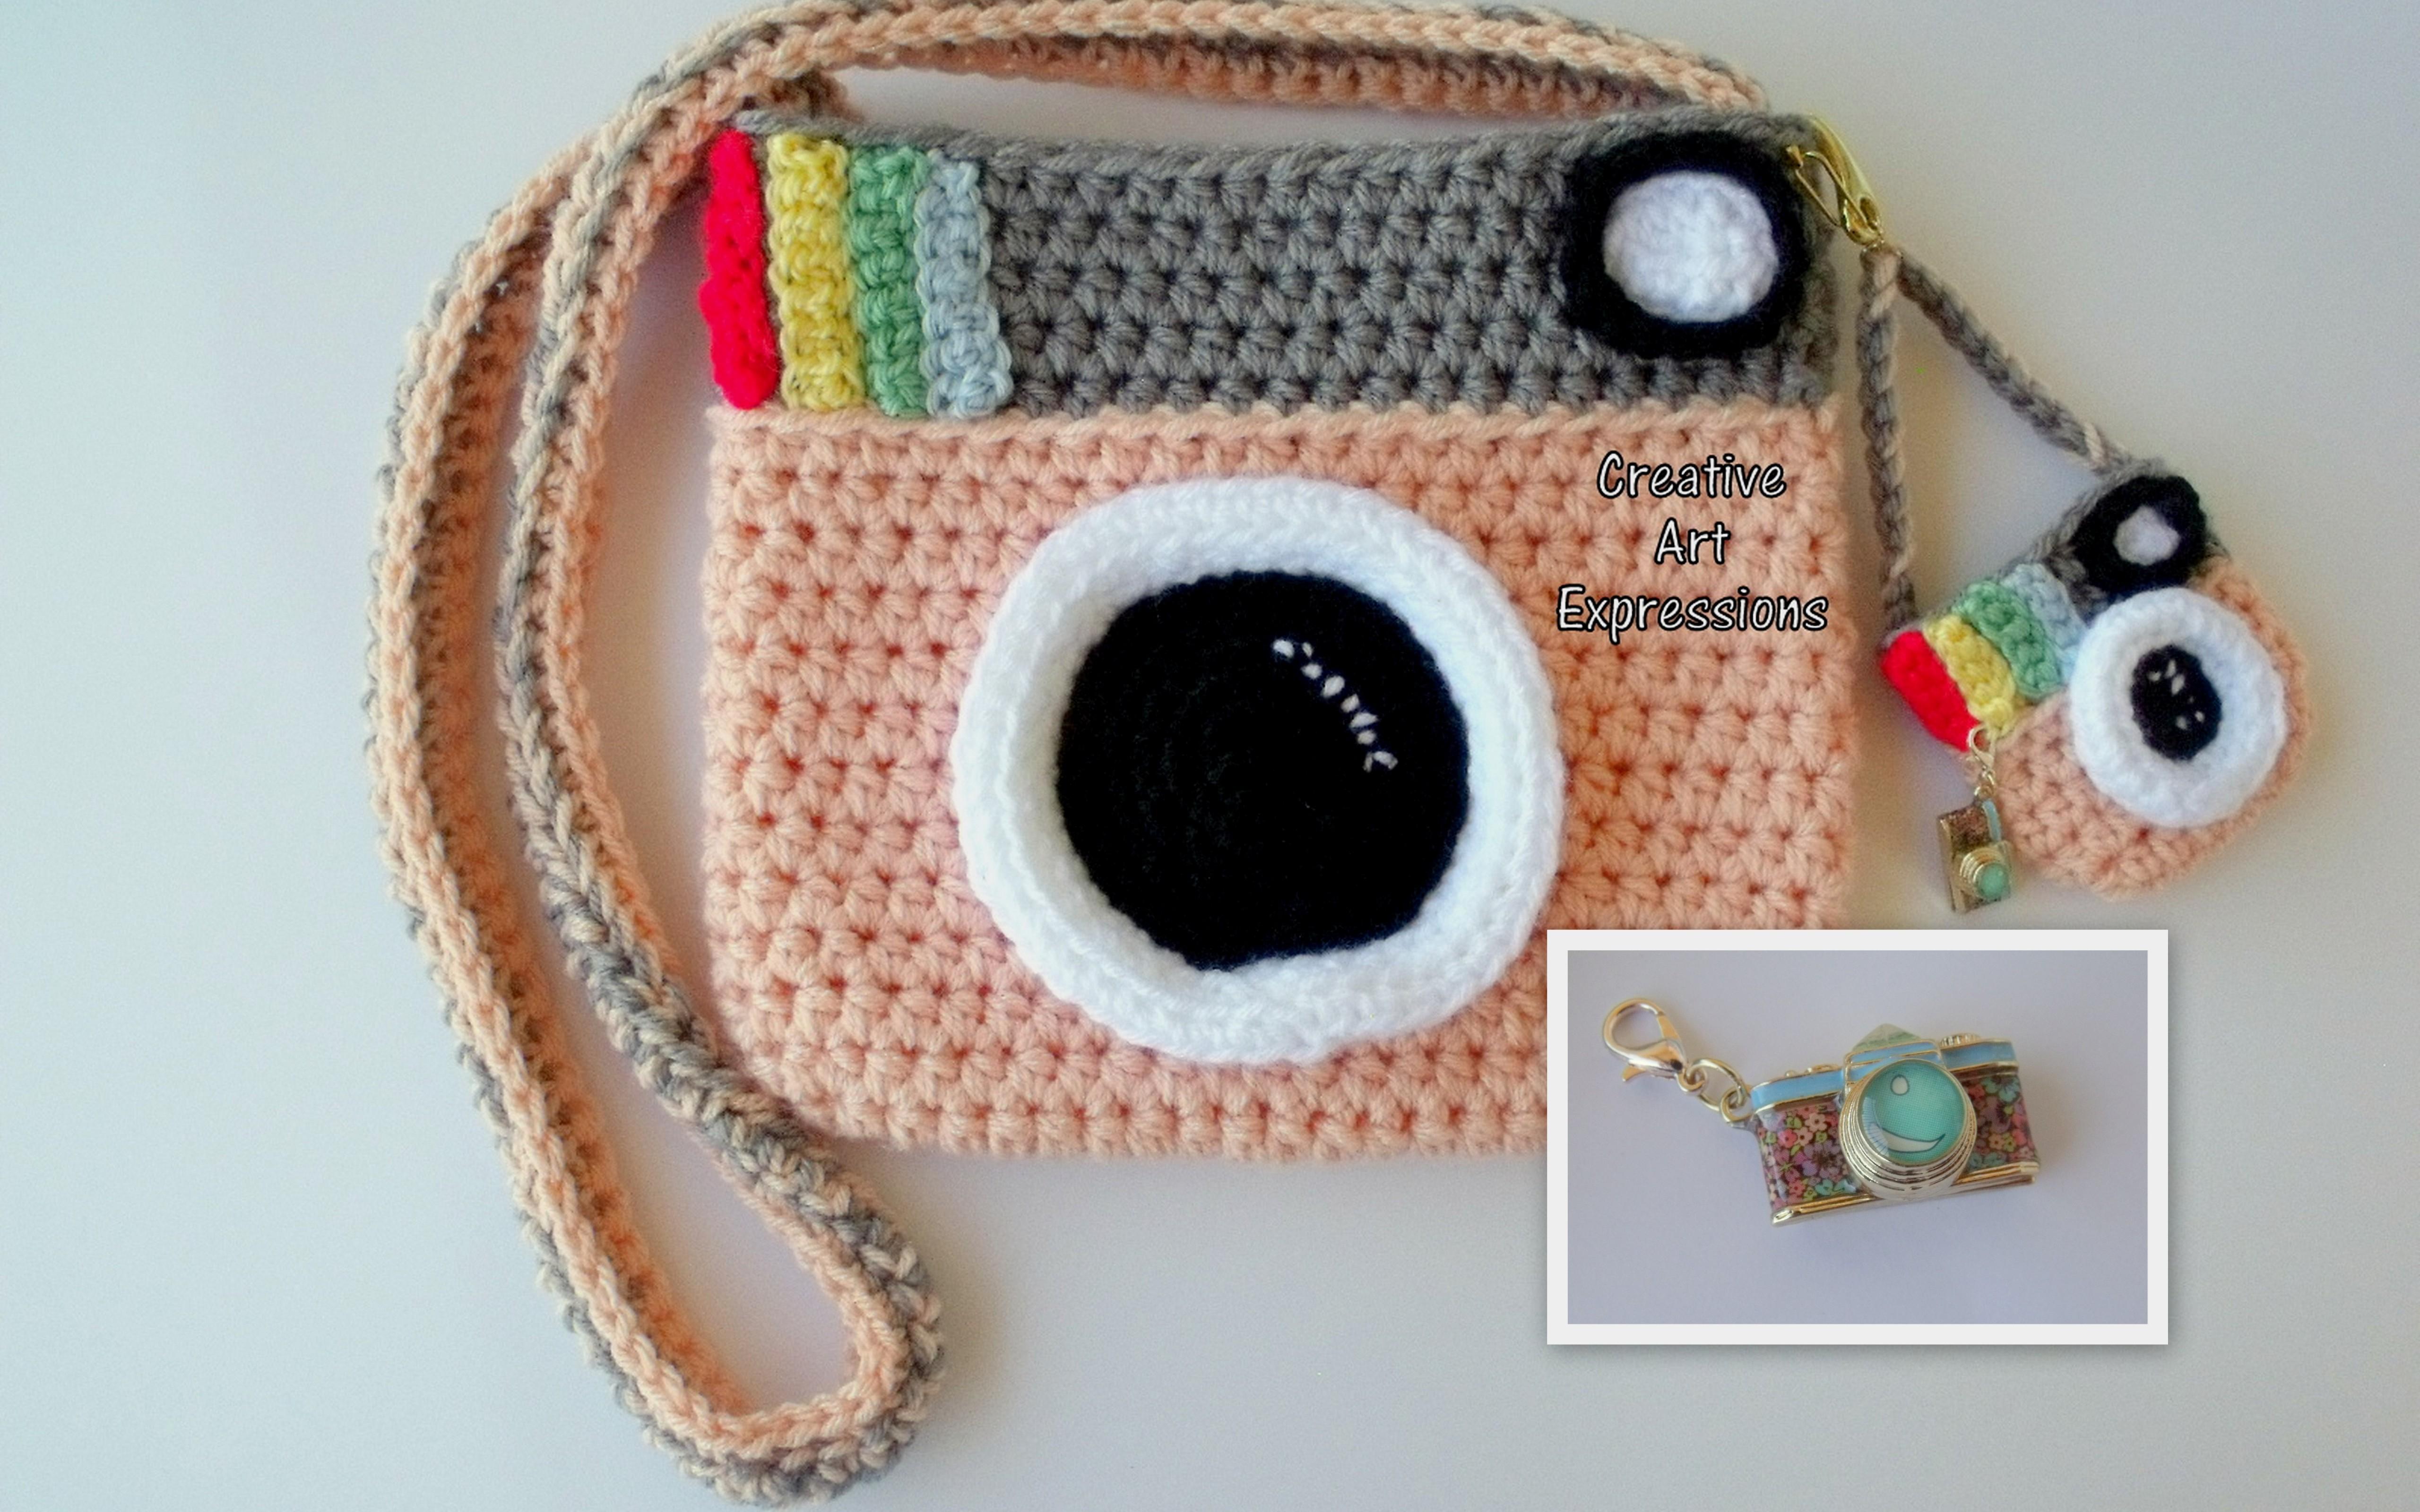 Camera Purse Peach Gray Bag Stylish Crochet Fashion Cute Handmade Fabric Lined